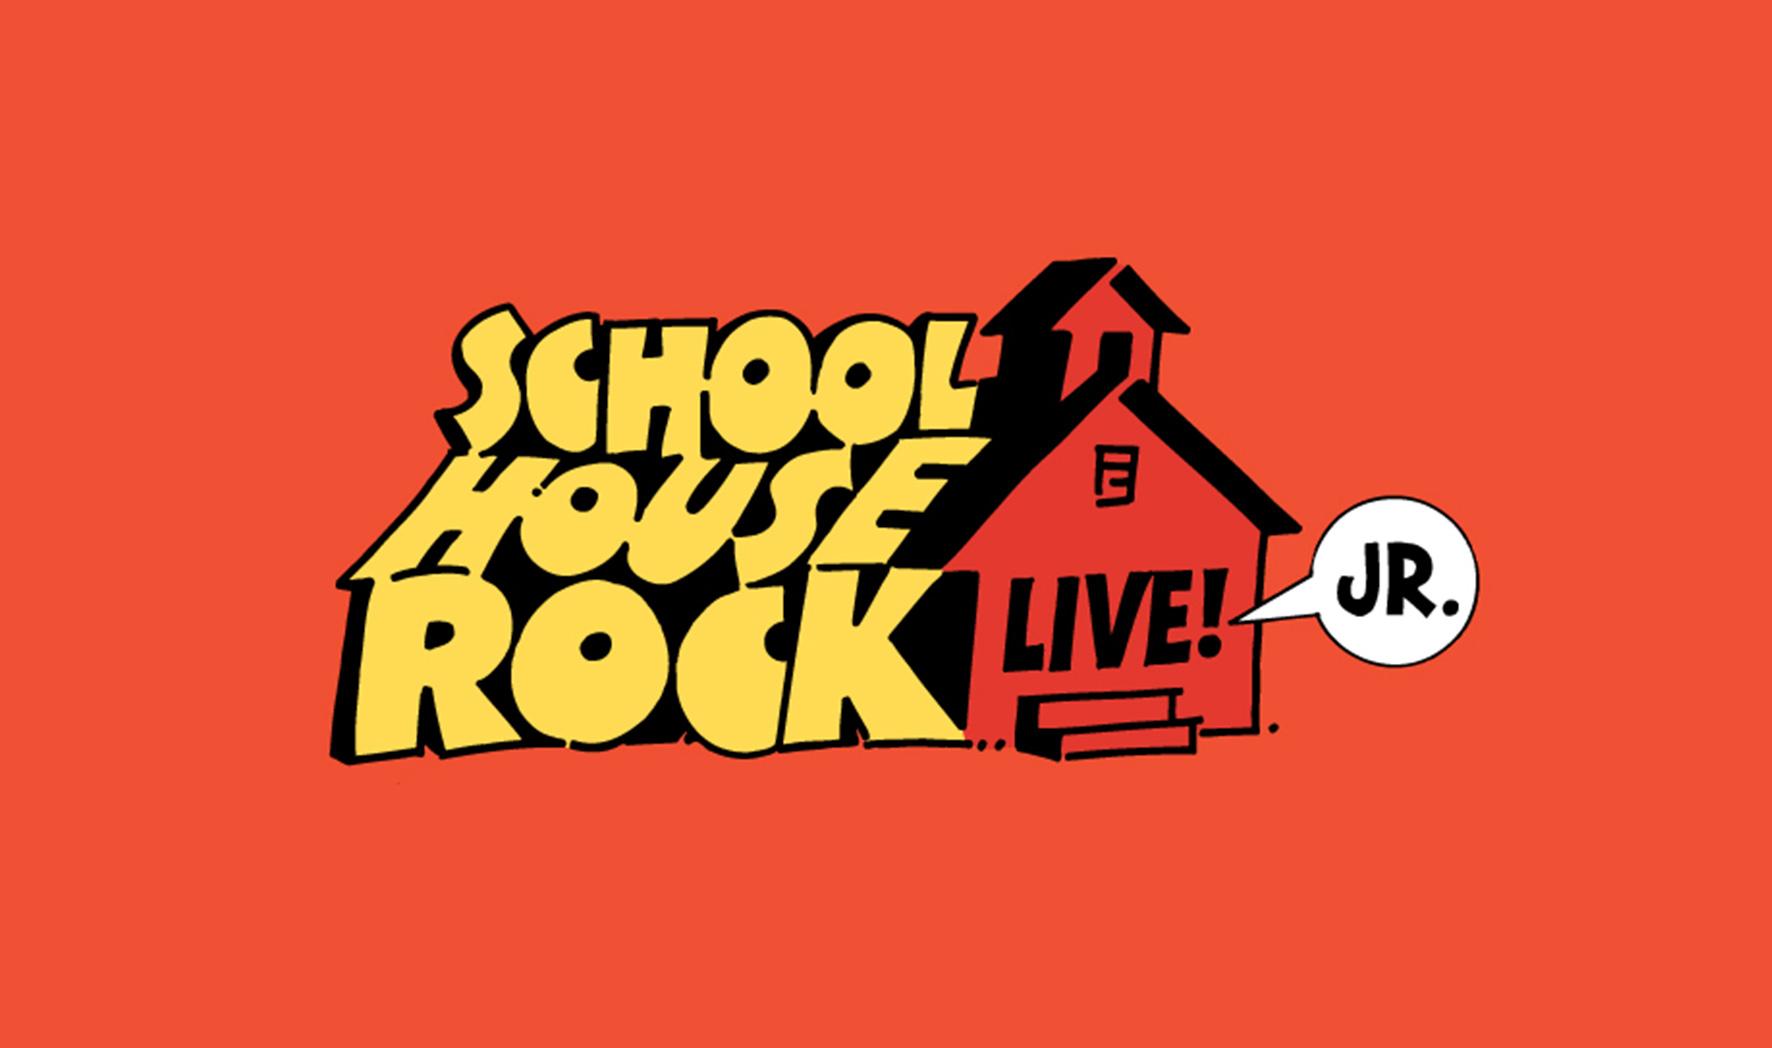 More Info for Schoolhouse Rock Live! JR.